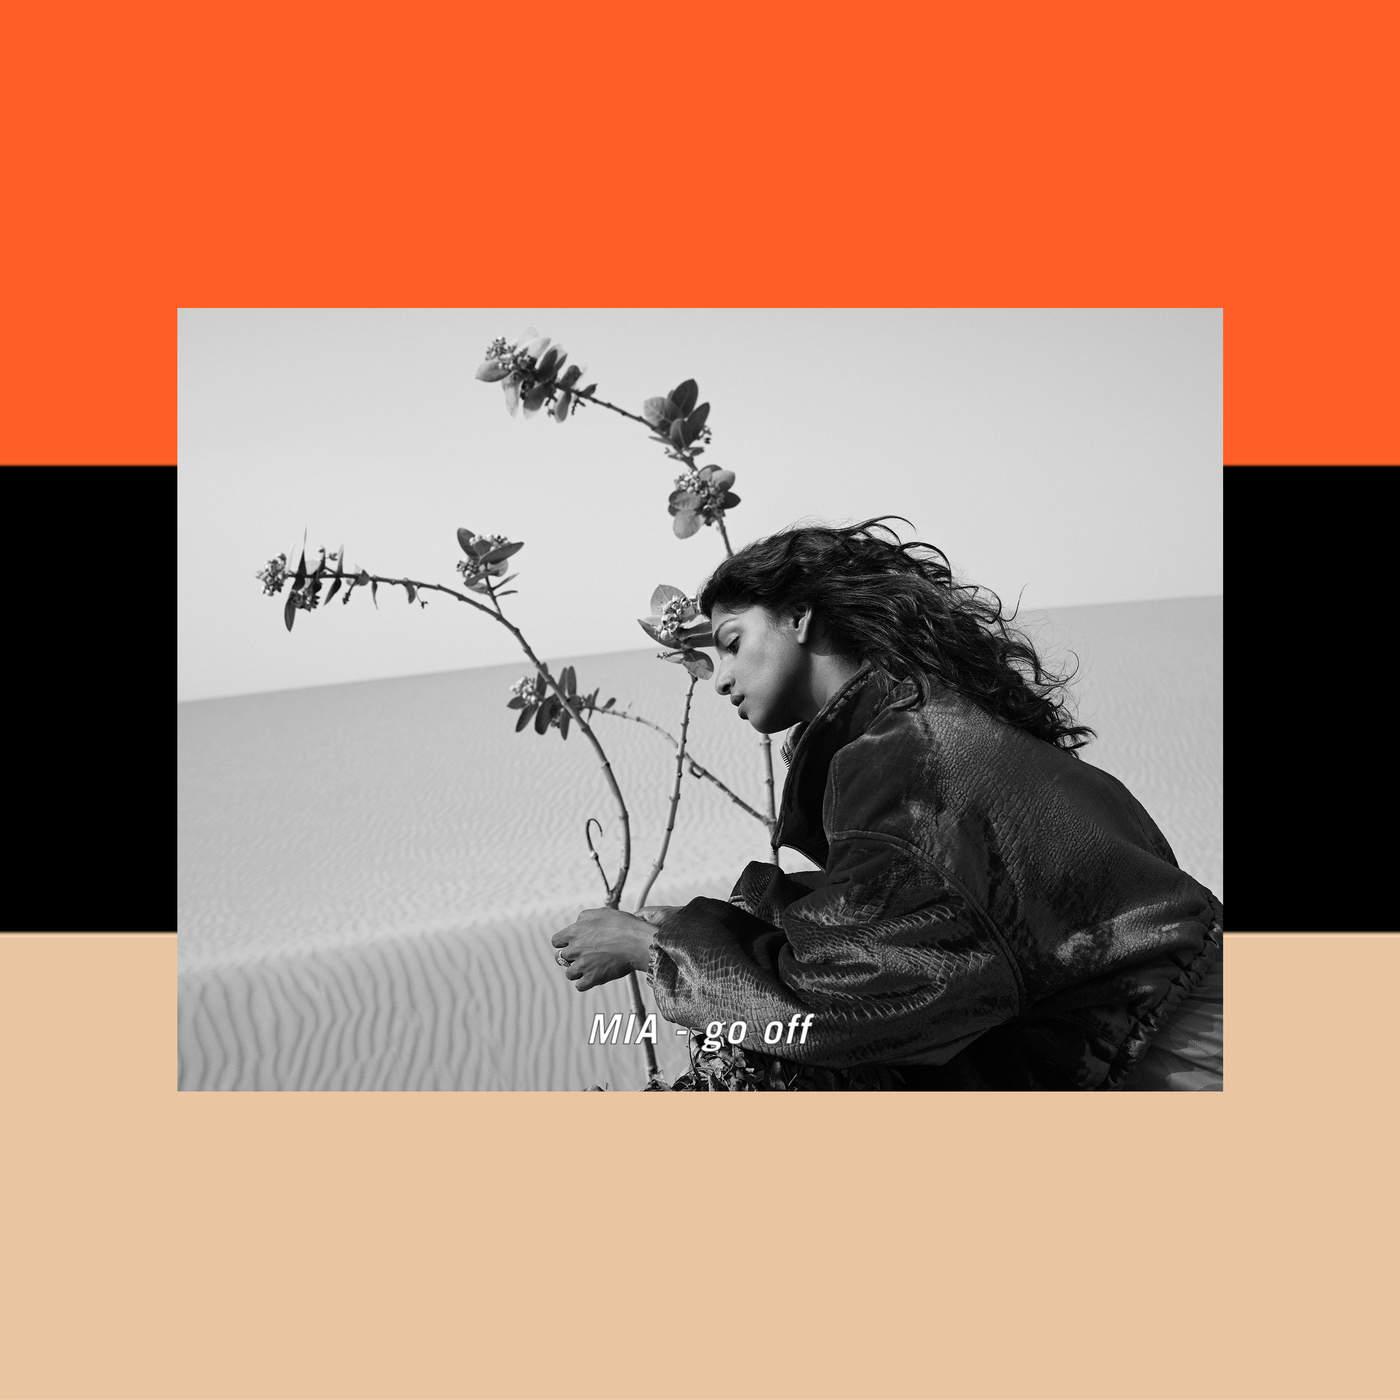 M.I.A. - Go Off - Single Cover